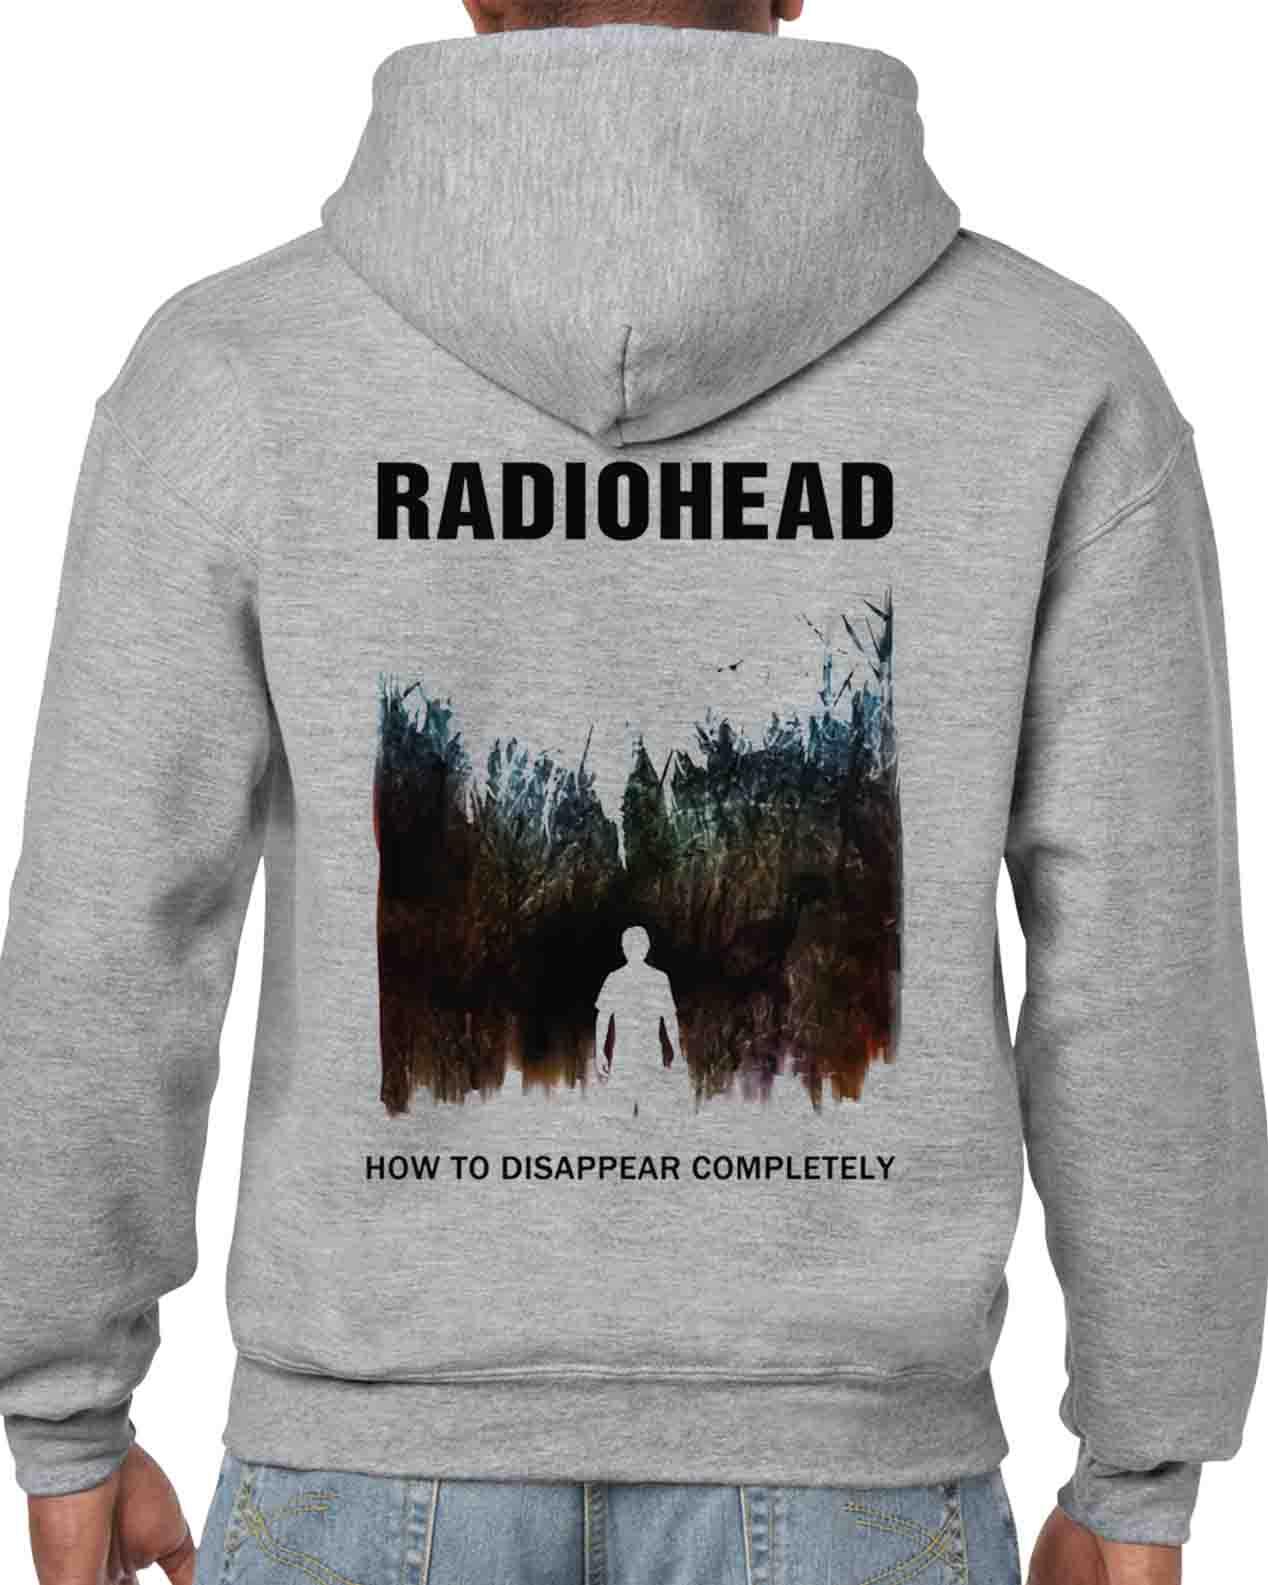 Radiohead - Disappear